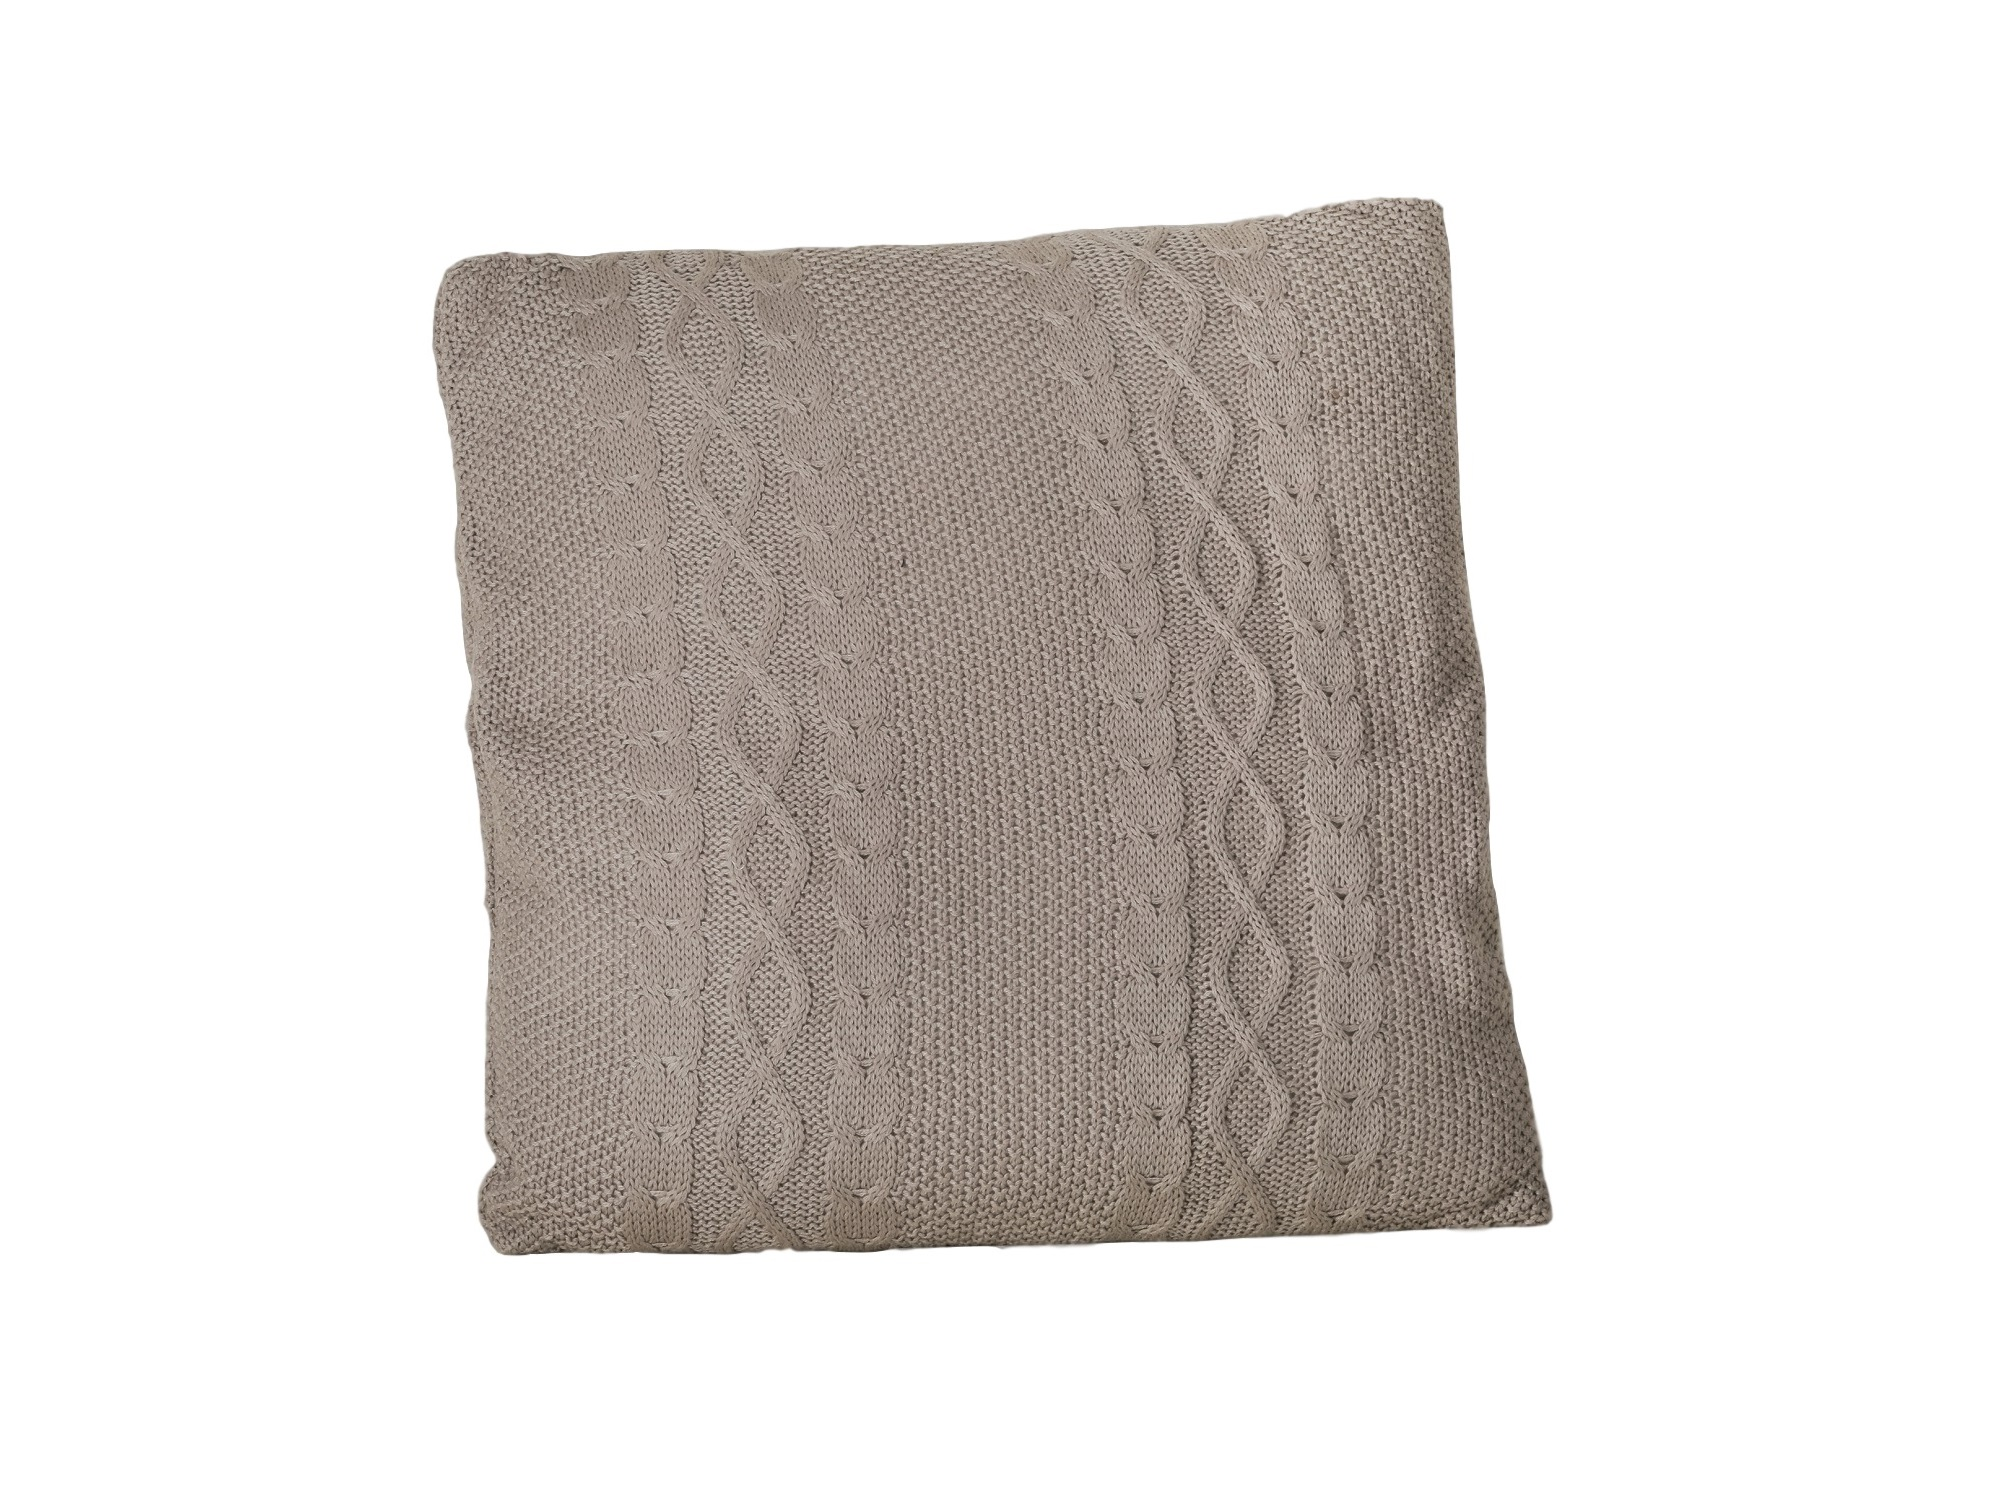 Подушка вязанаяКвадратные подушки<br>Подушка декоративная квадратная в вязаном чехле<br><br>Material: Текстиль<br>Width см: 55<br>Depth см: 10<br>Height см: 55